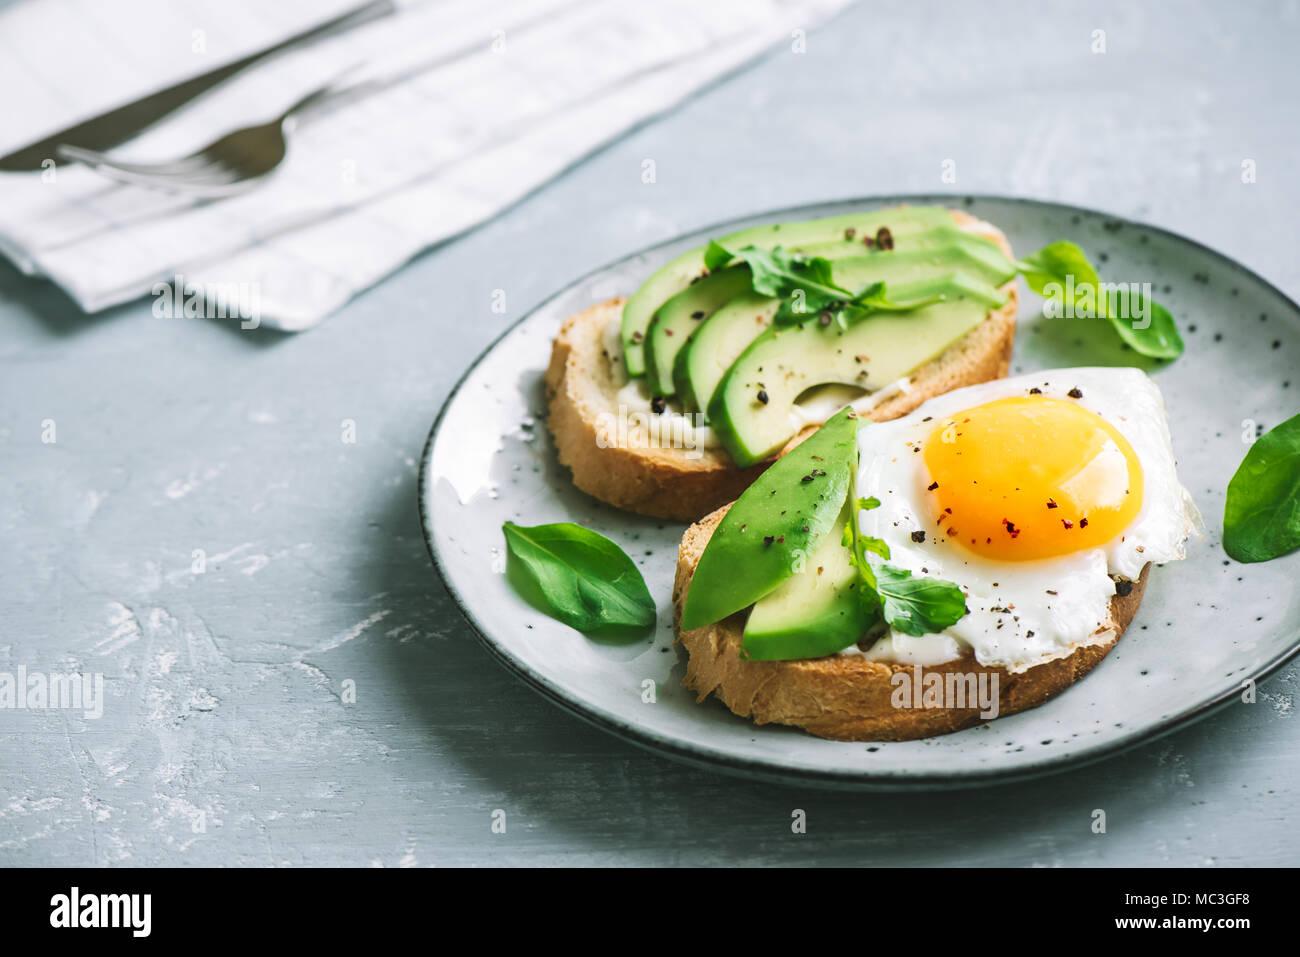 Avocado Sandwich With Fried Egg